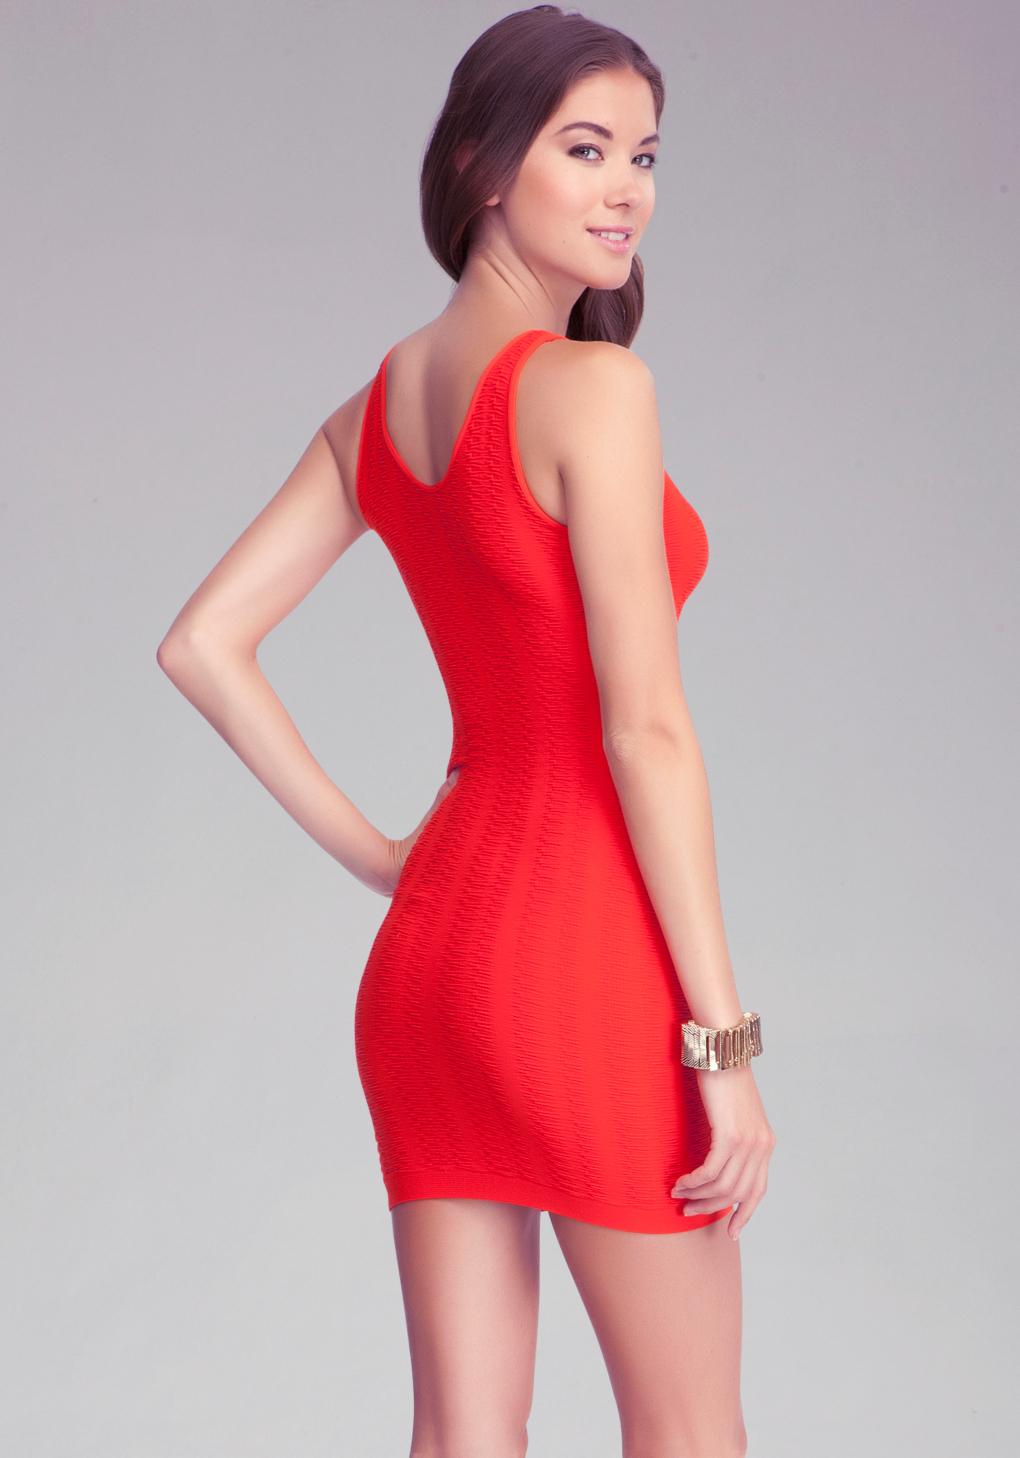 Bebe Textured Tubular Tank Dress in Red  Lyst